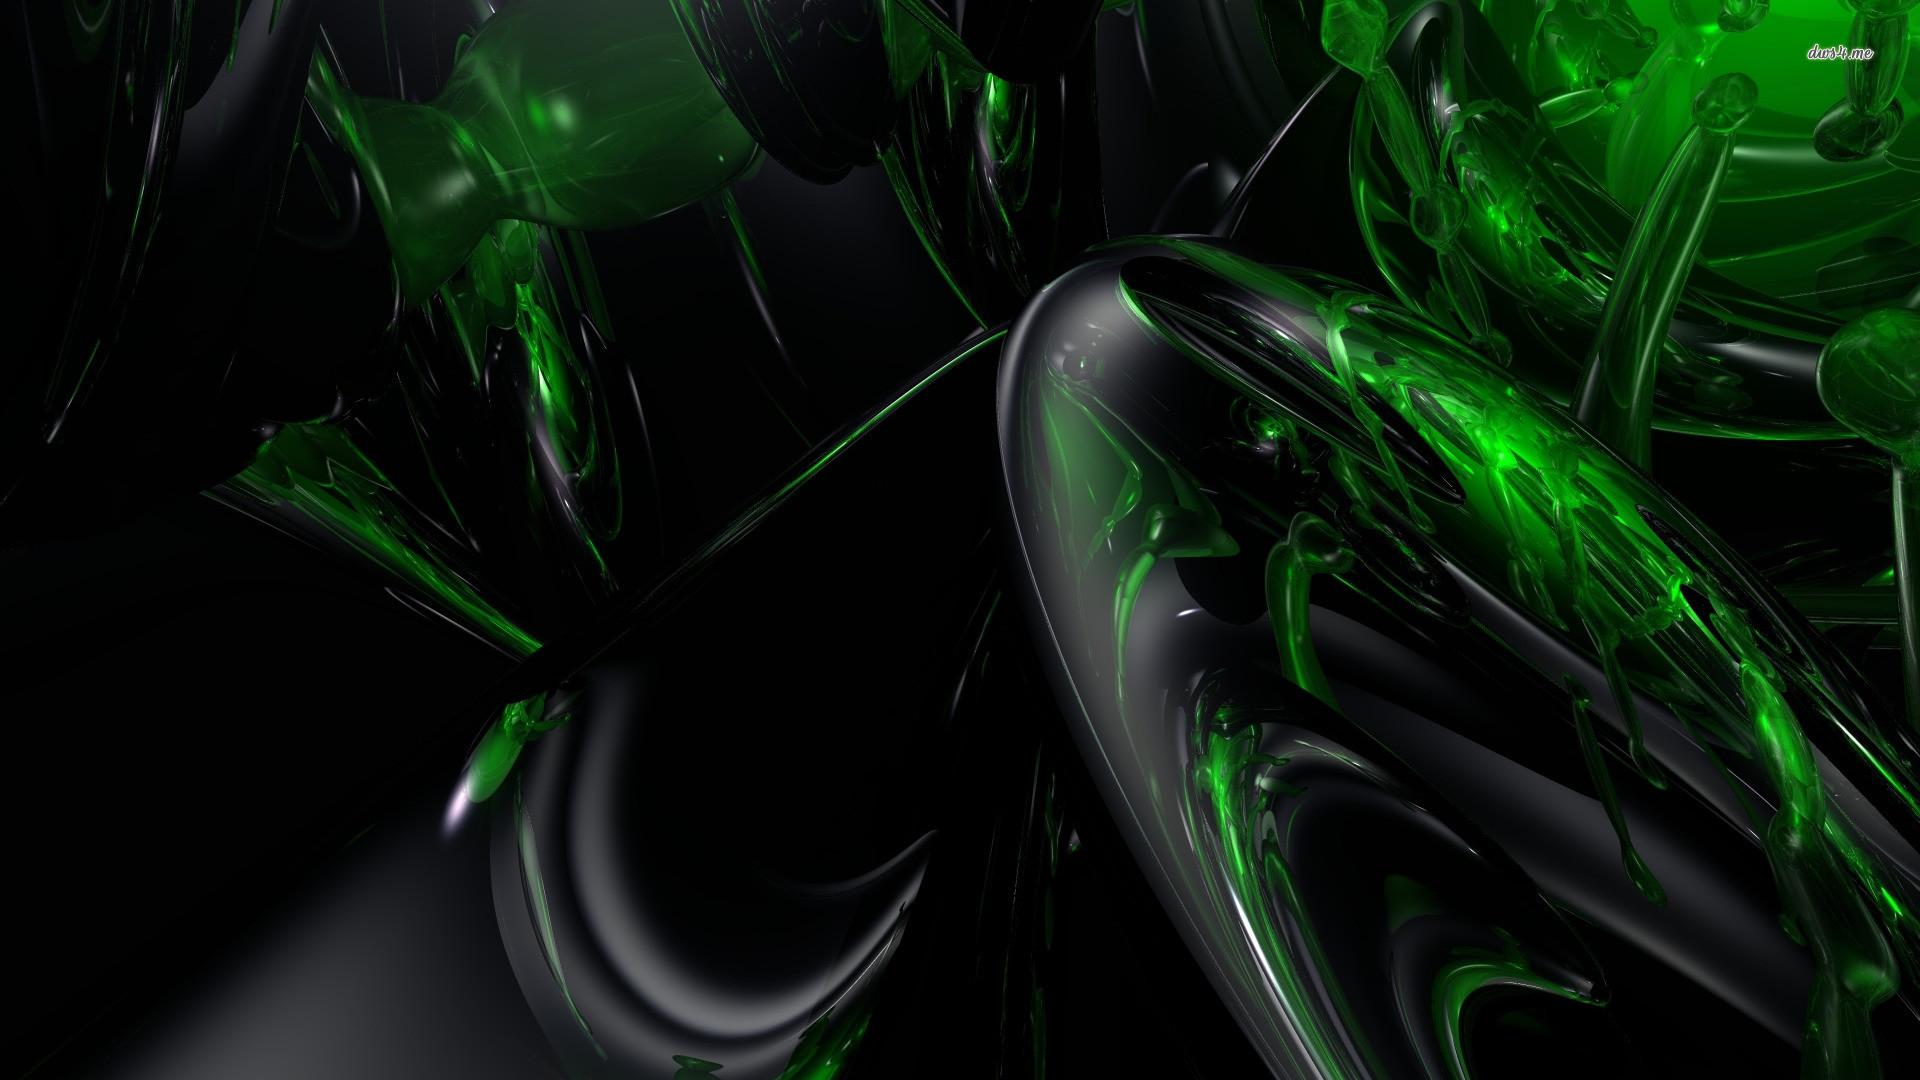 wallpaper for desktop hd green HD Wallpapers Green HD Wallpapers Wallpapers)